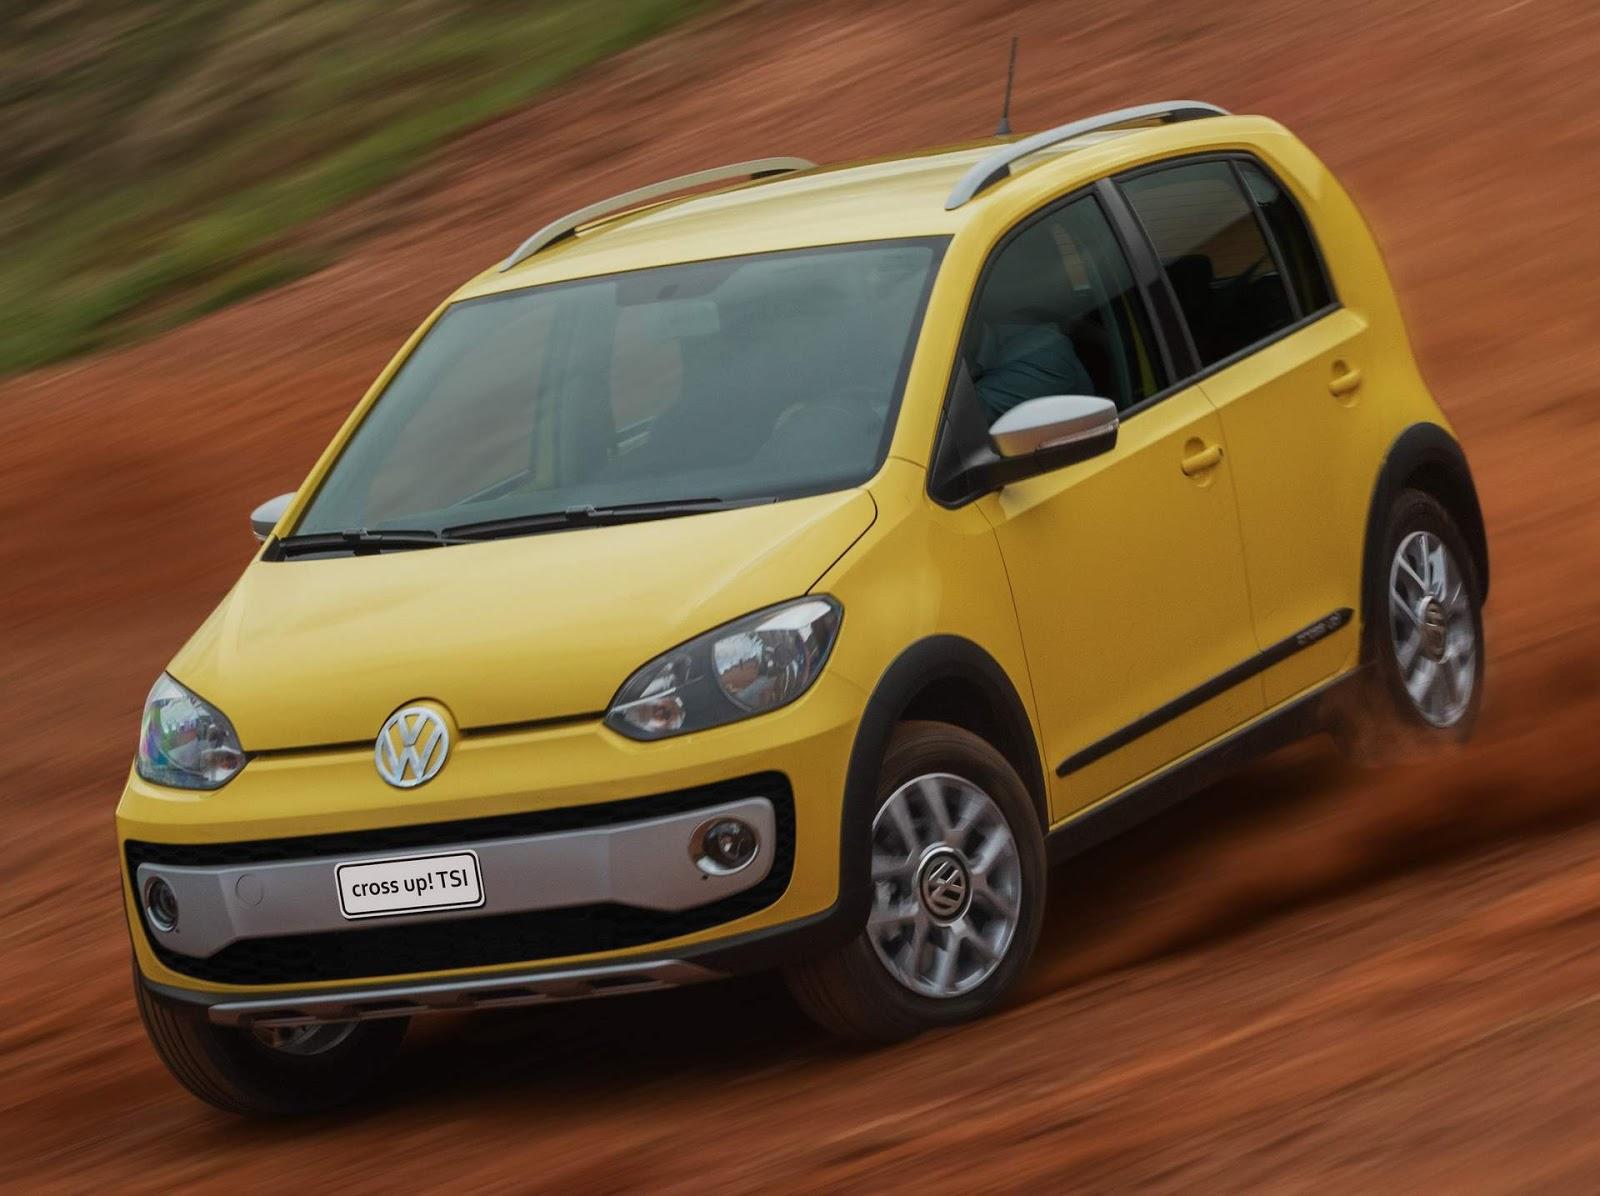 Volkswagen: 3ª marca mais vendida do Brasil em julho de 2016